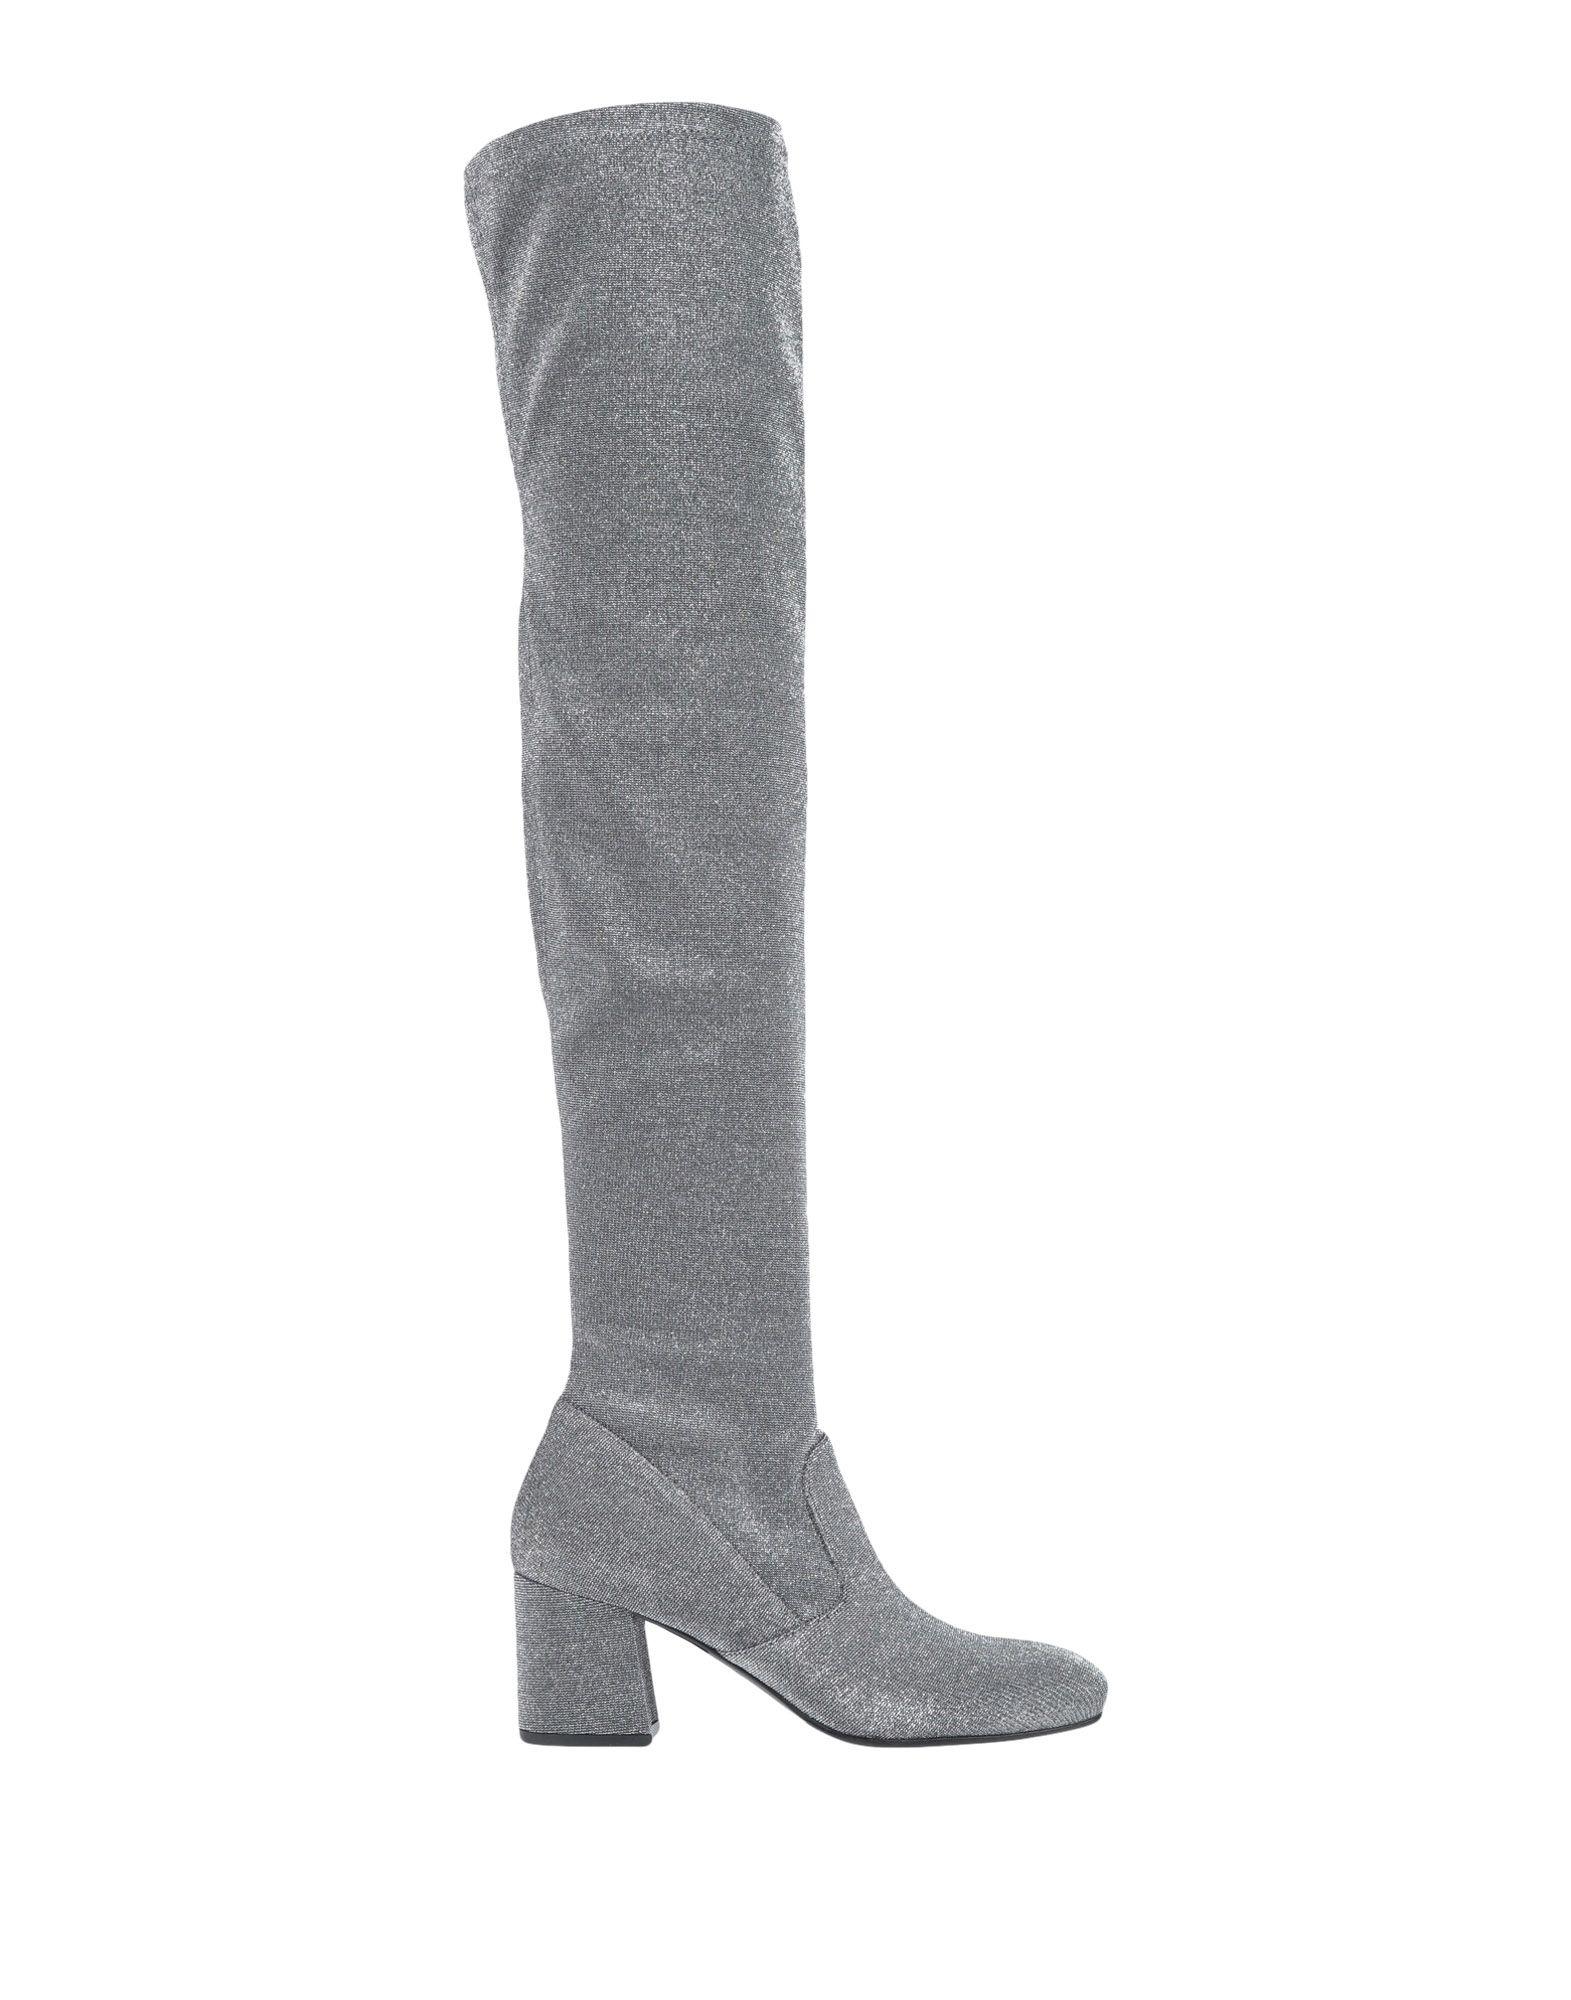 Le Silla Boots - Women Le Silla Silla Silla Boots online on  United Kingdom - 11523635DI 8d5ce2